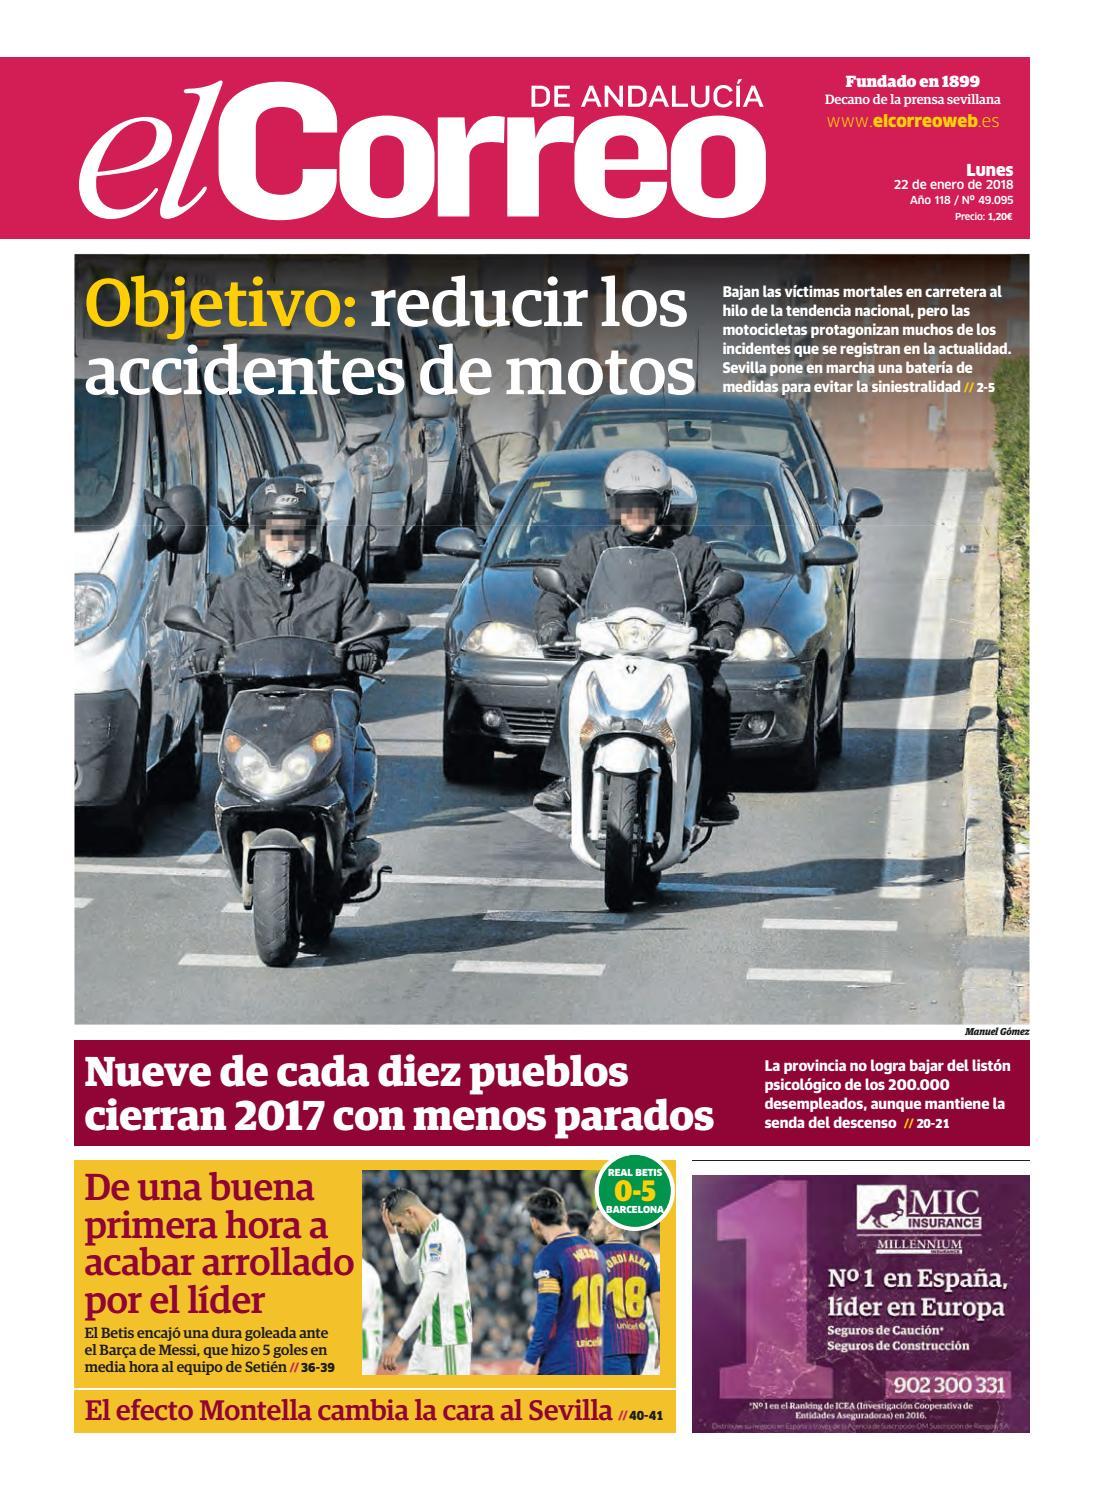 22 01 2018 El Correo De Andaluc A By El Correo De Andaluc A S L  # Muebles Pepe Jesus Vecindario